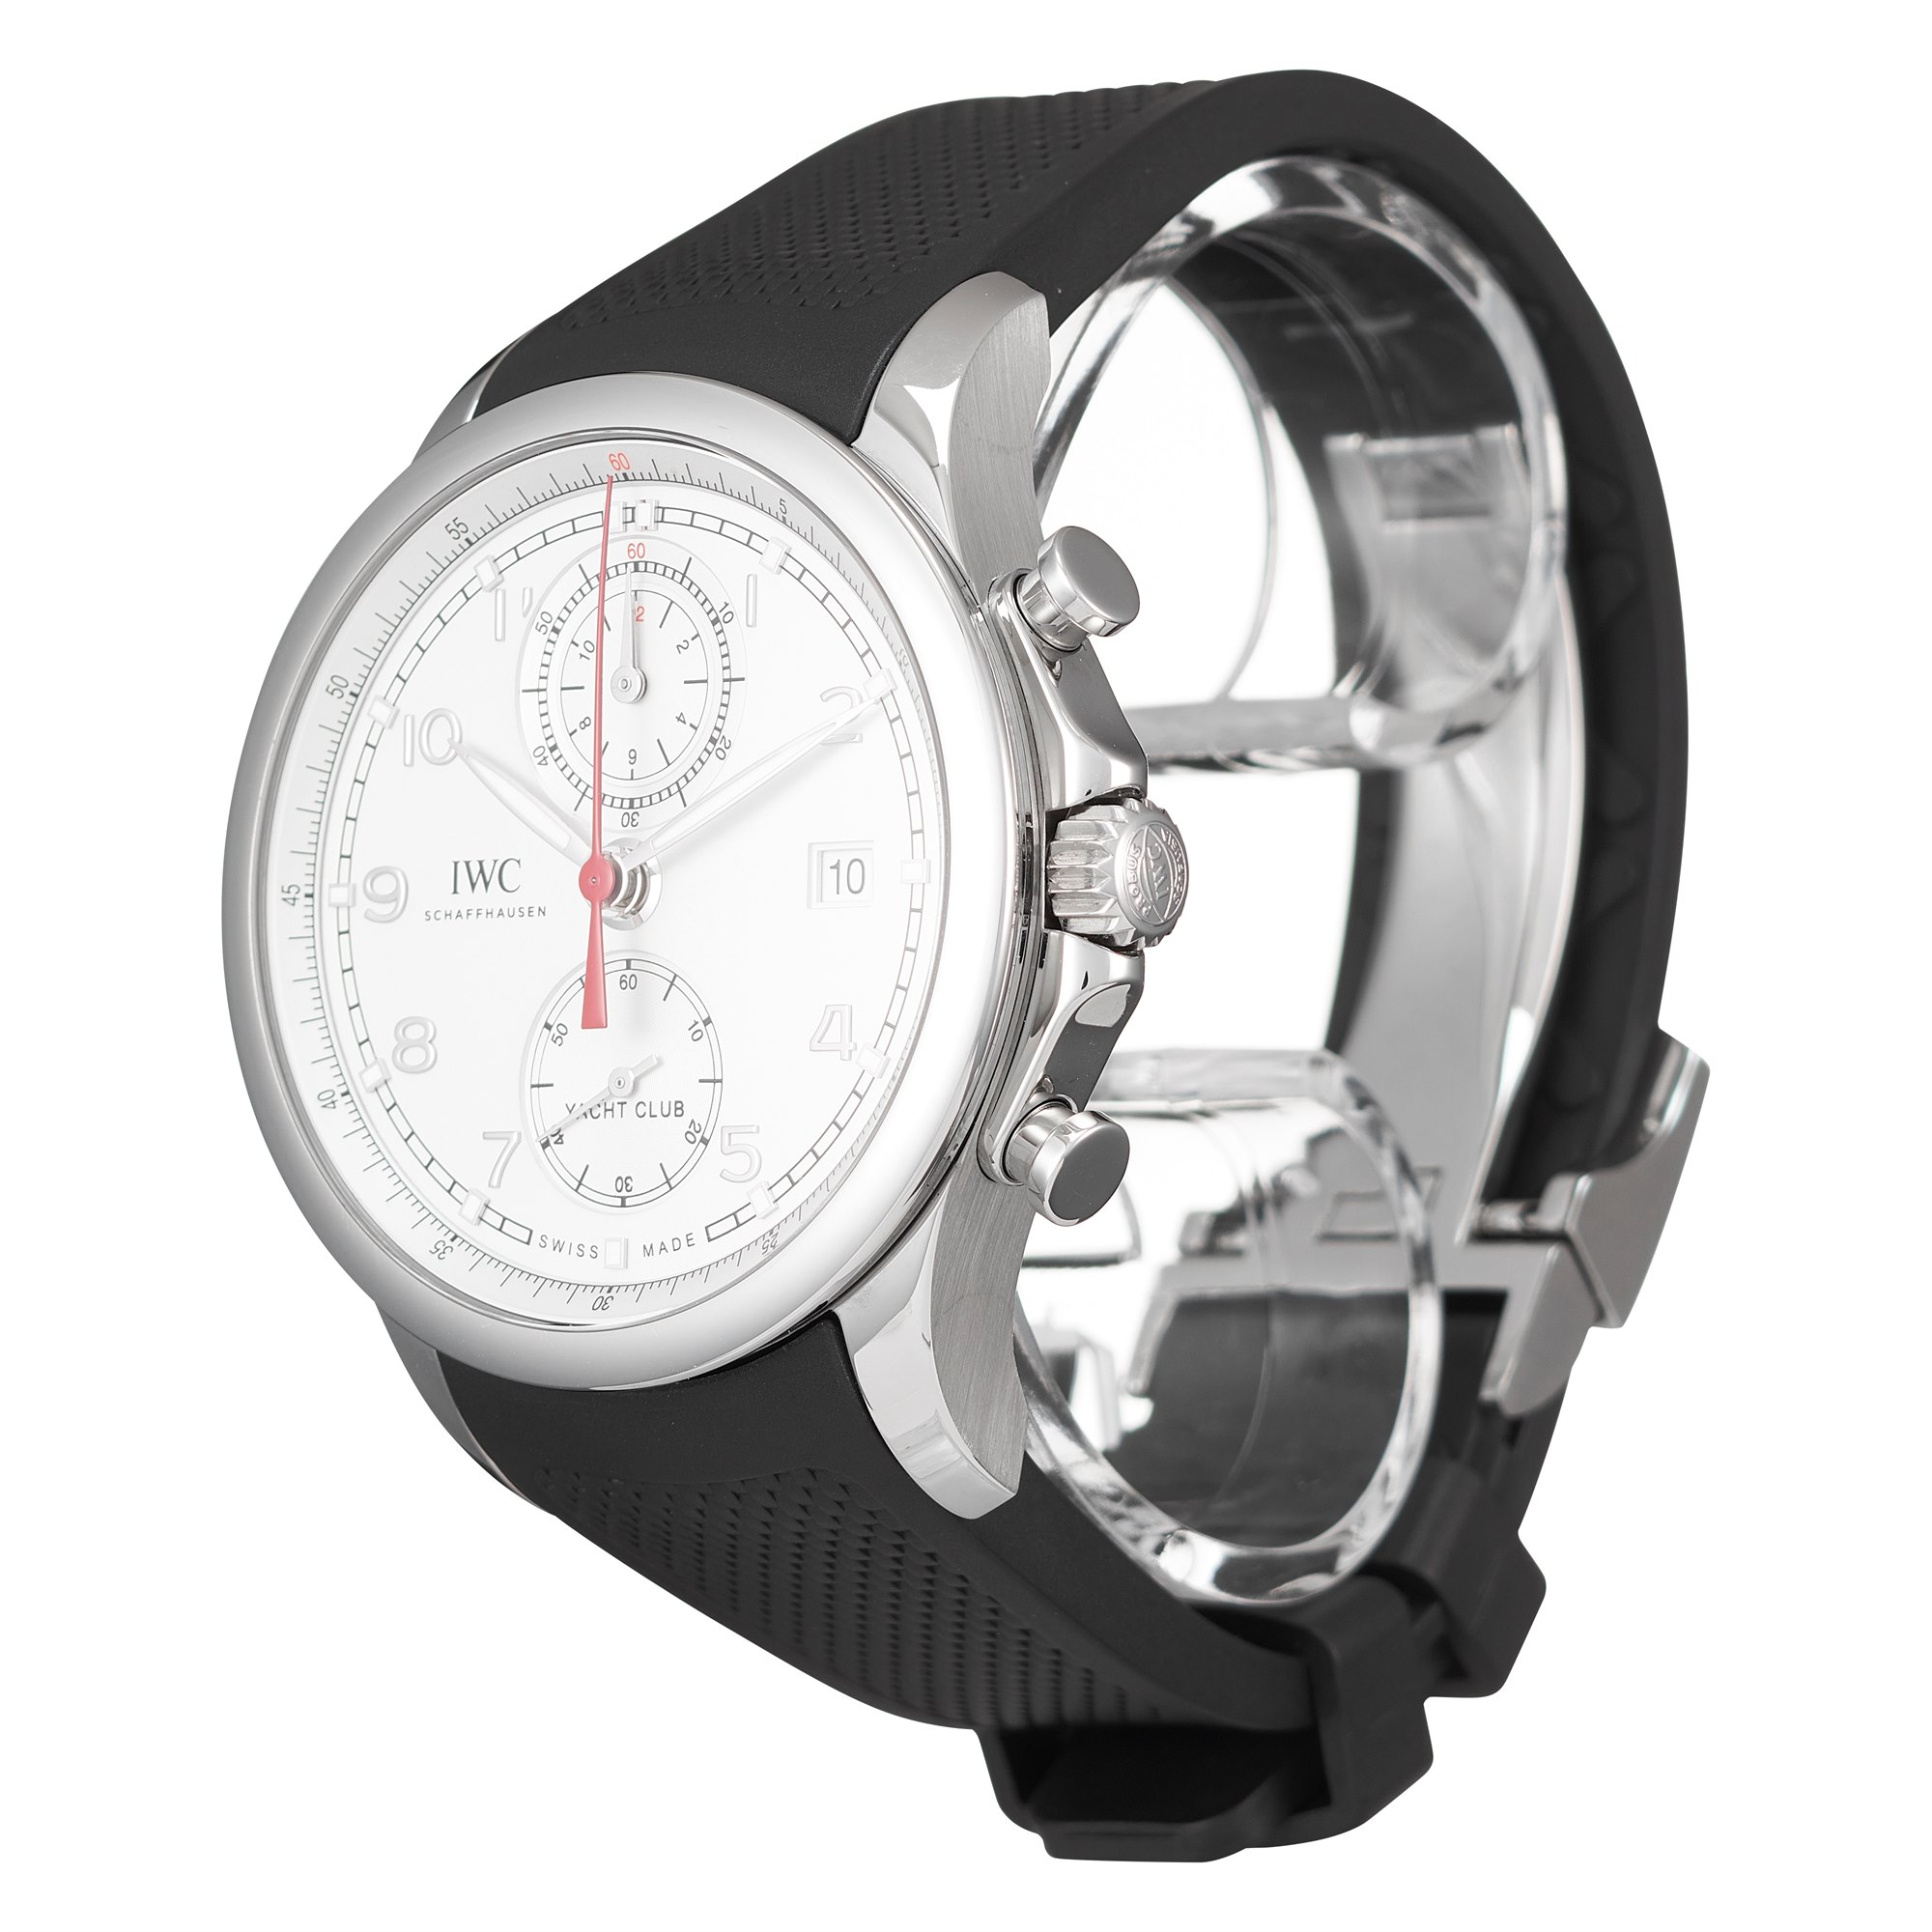 IWC Portugieser Yacht Club Chronograph Stainless Steel IW390502